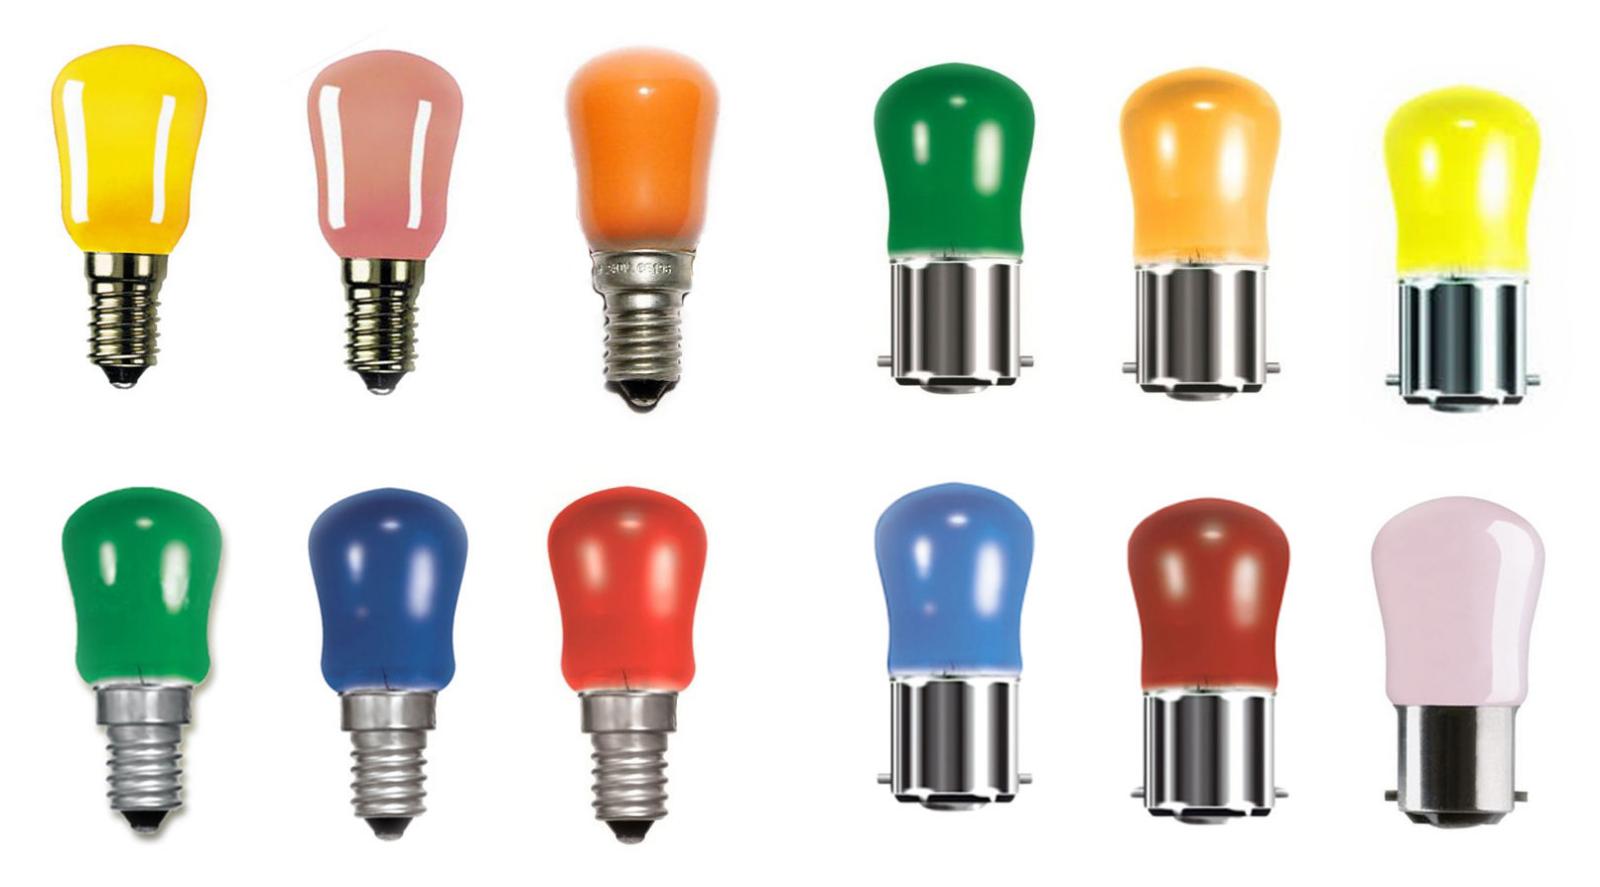 5 x Coloured Pink Pygmy Light Bulbs Sign Lamp Small Bayonet B15 15 Watt